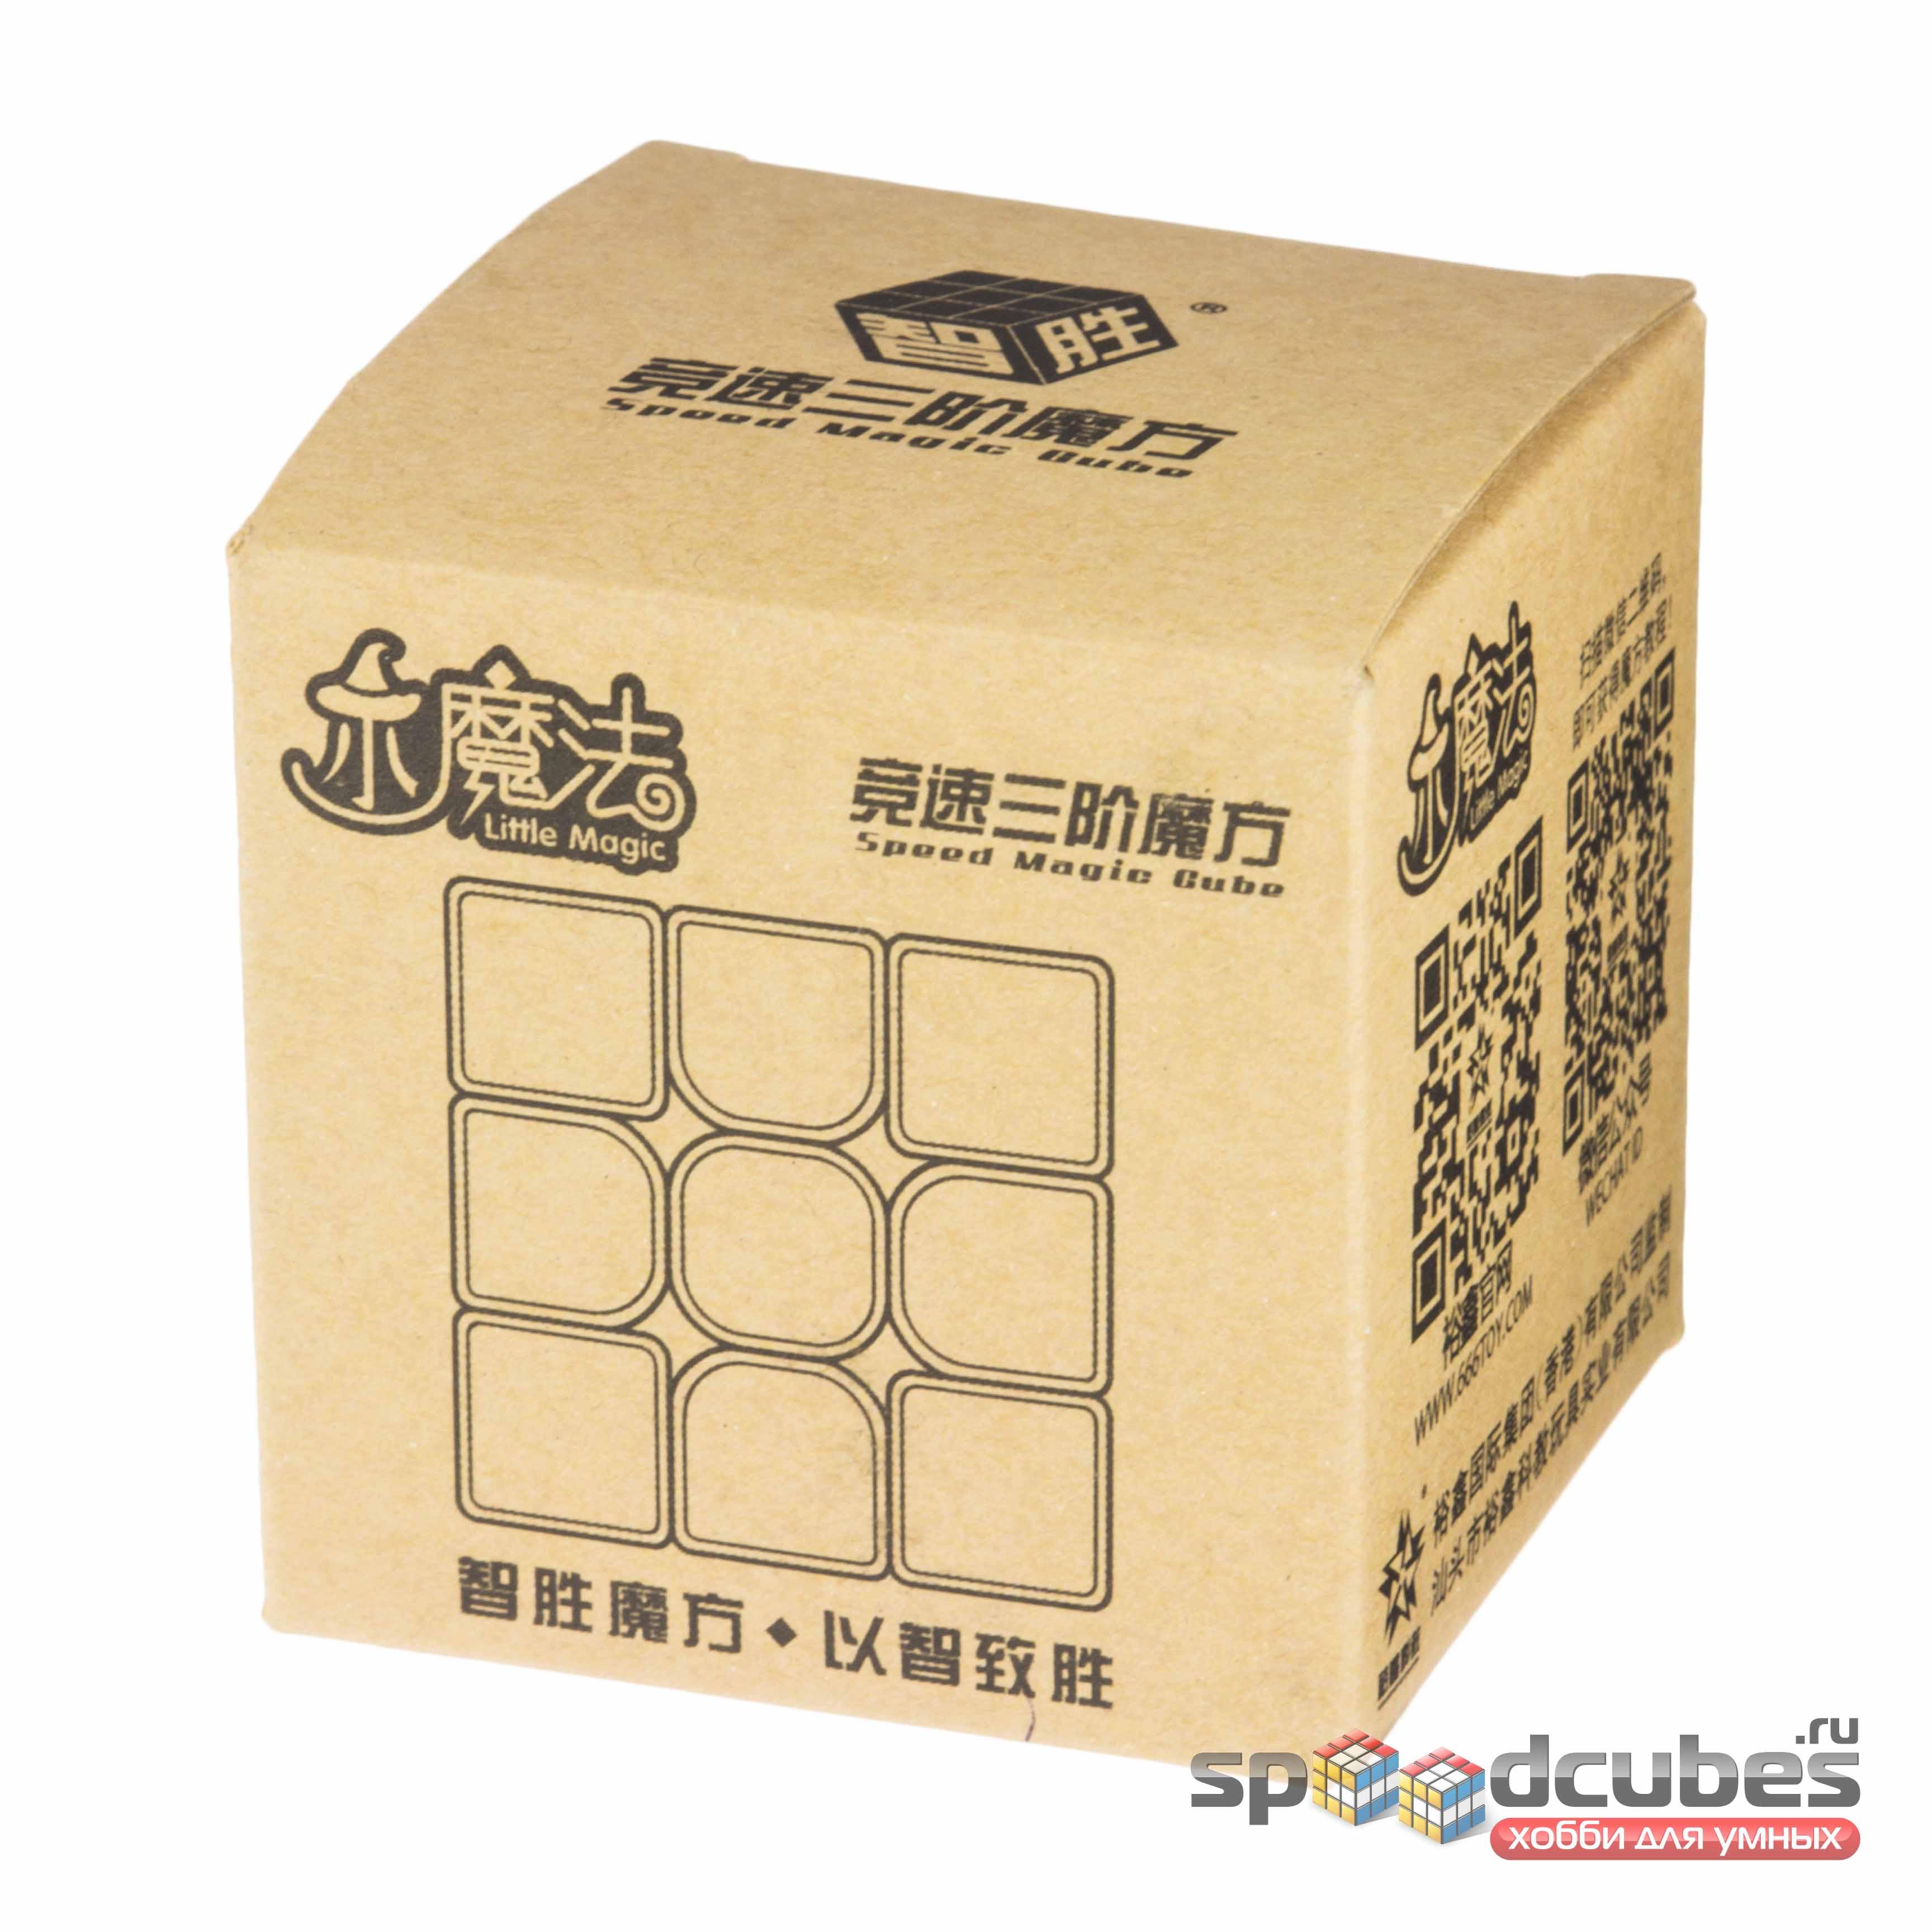 Yuxin 3x3x3 Little Magic Black 1